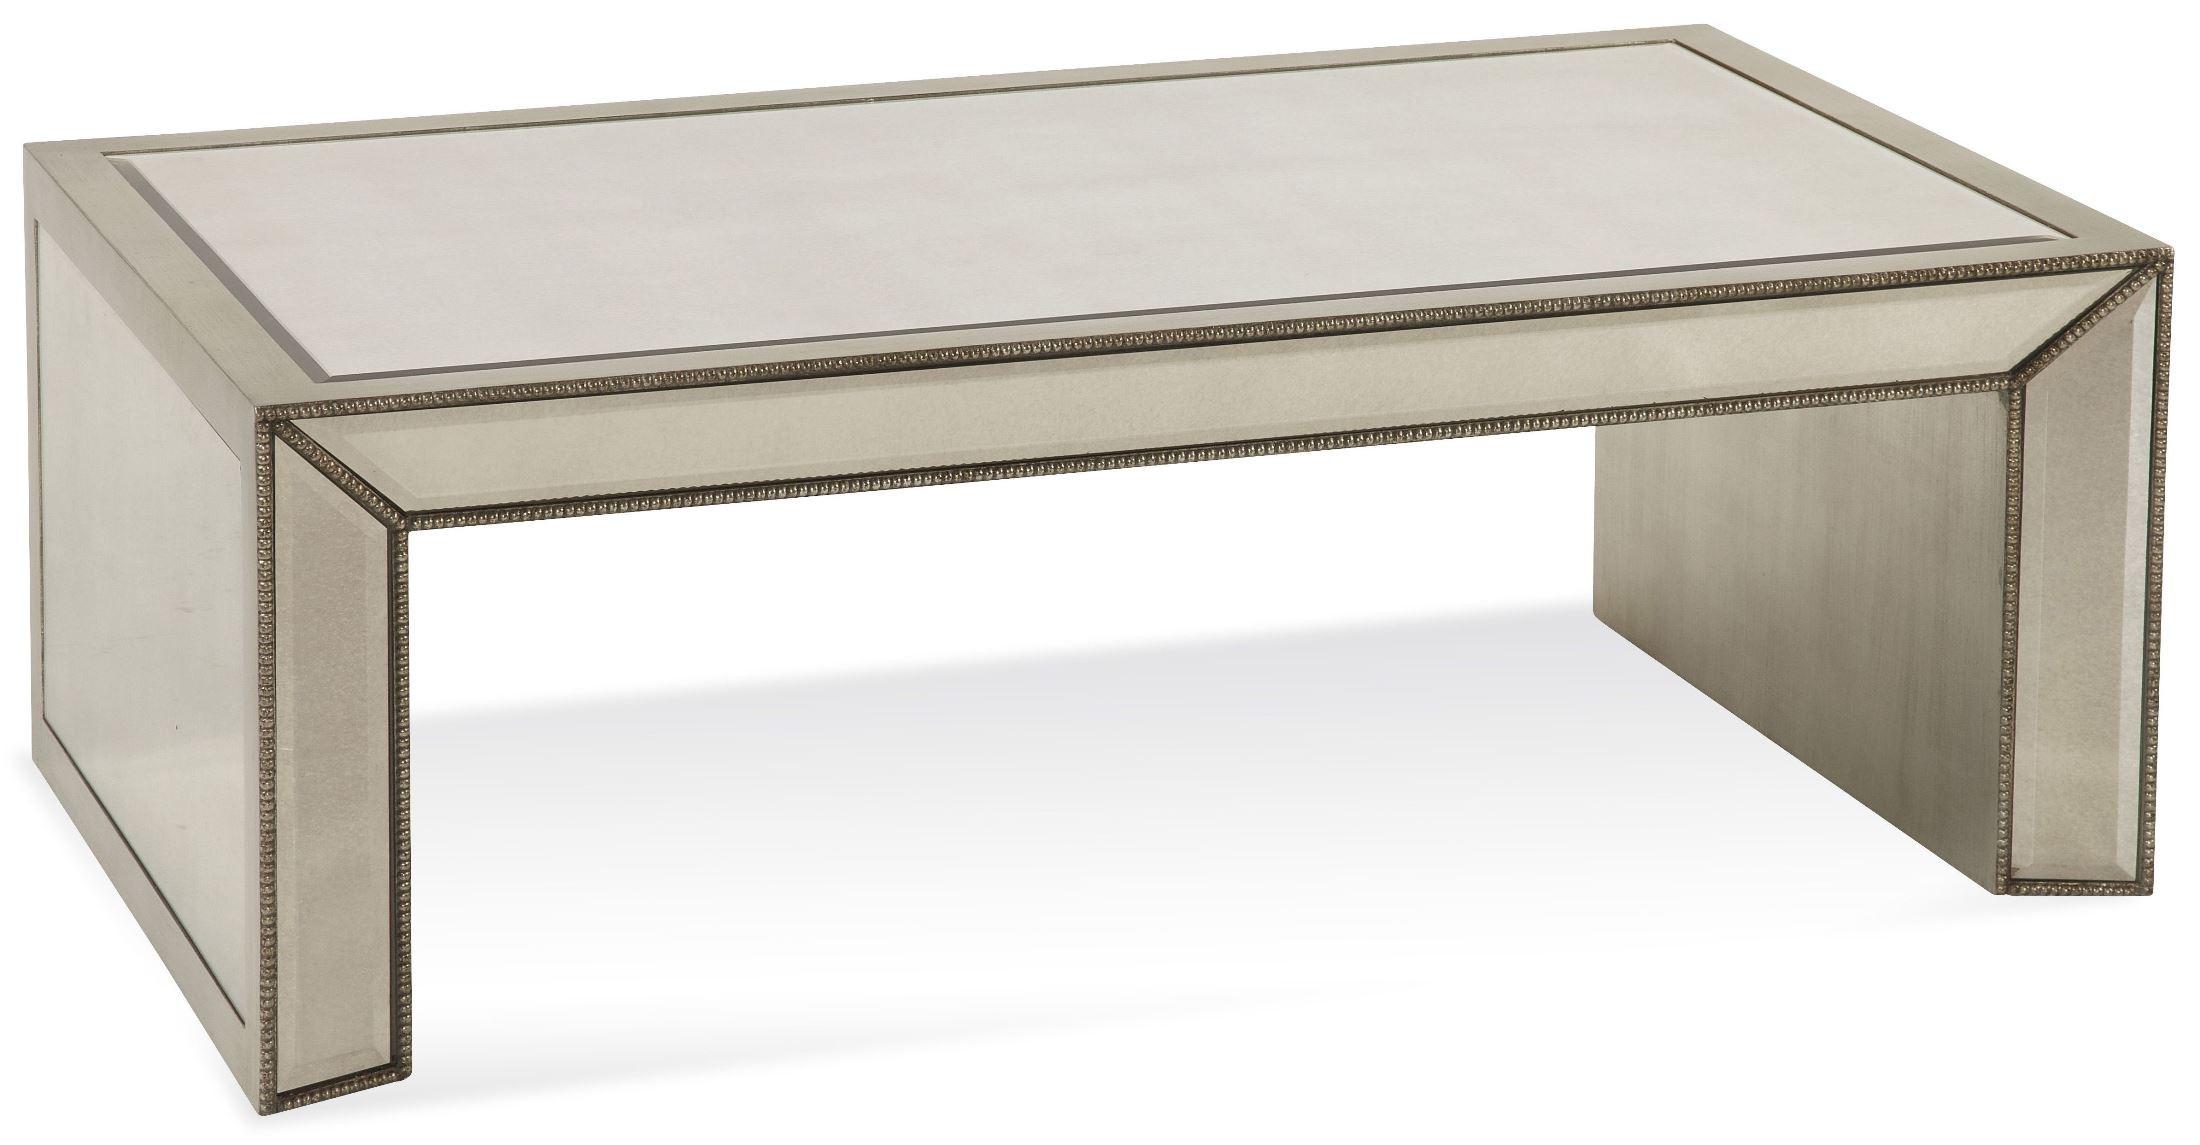 Murano antique mirrored rectangular cocktail table t2624 for Mirrored rectangular coffee table